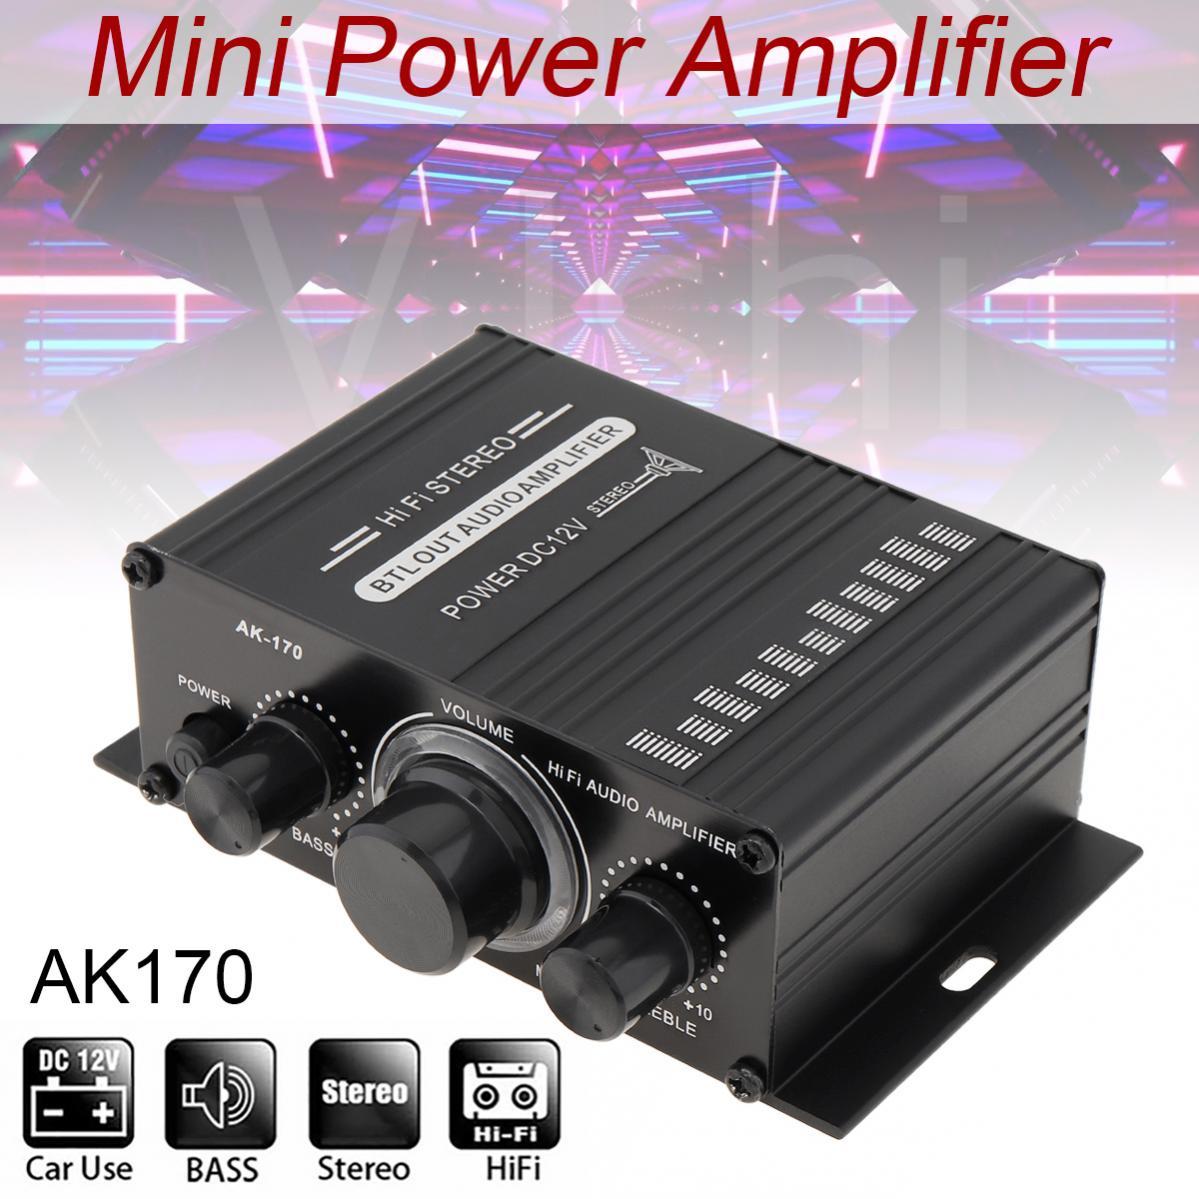 Car Stereo Audio High Power Amplifier Audio Karaoke Home Theater Amplifier 2 Channel Bluetooth Class D Amplifier USB/SD